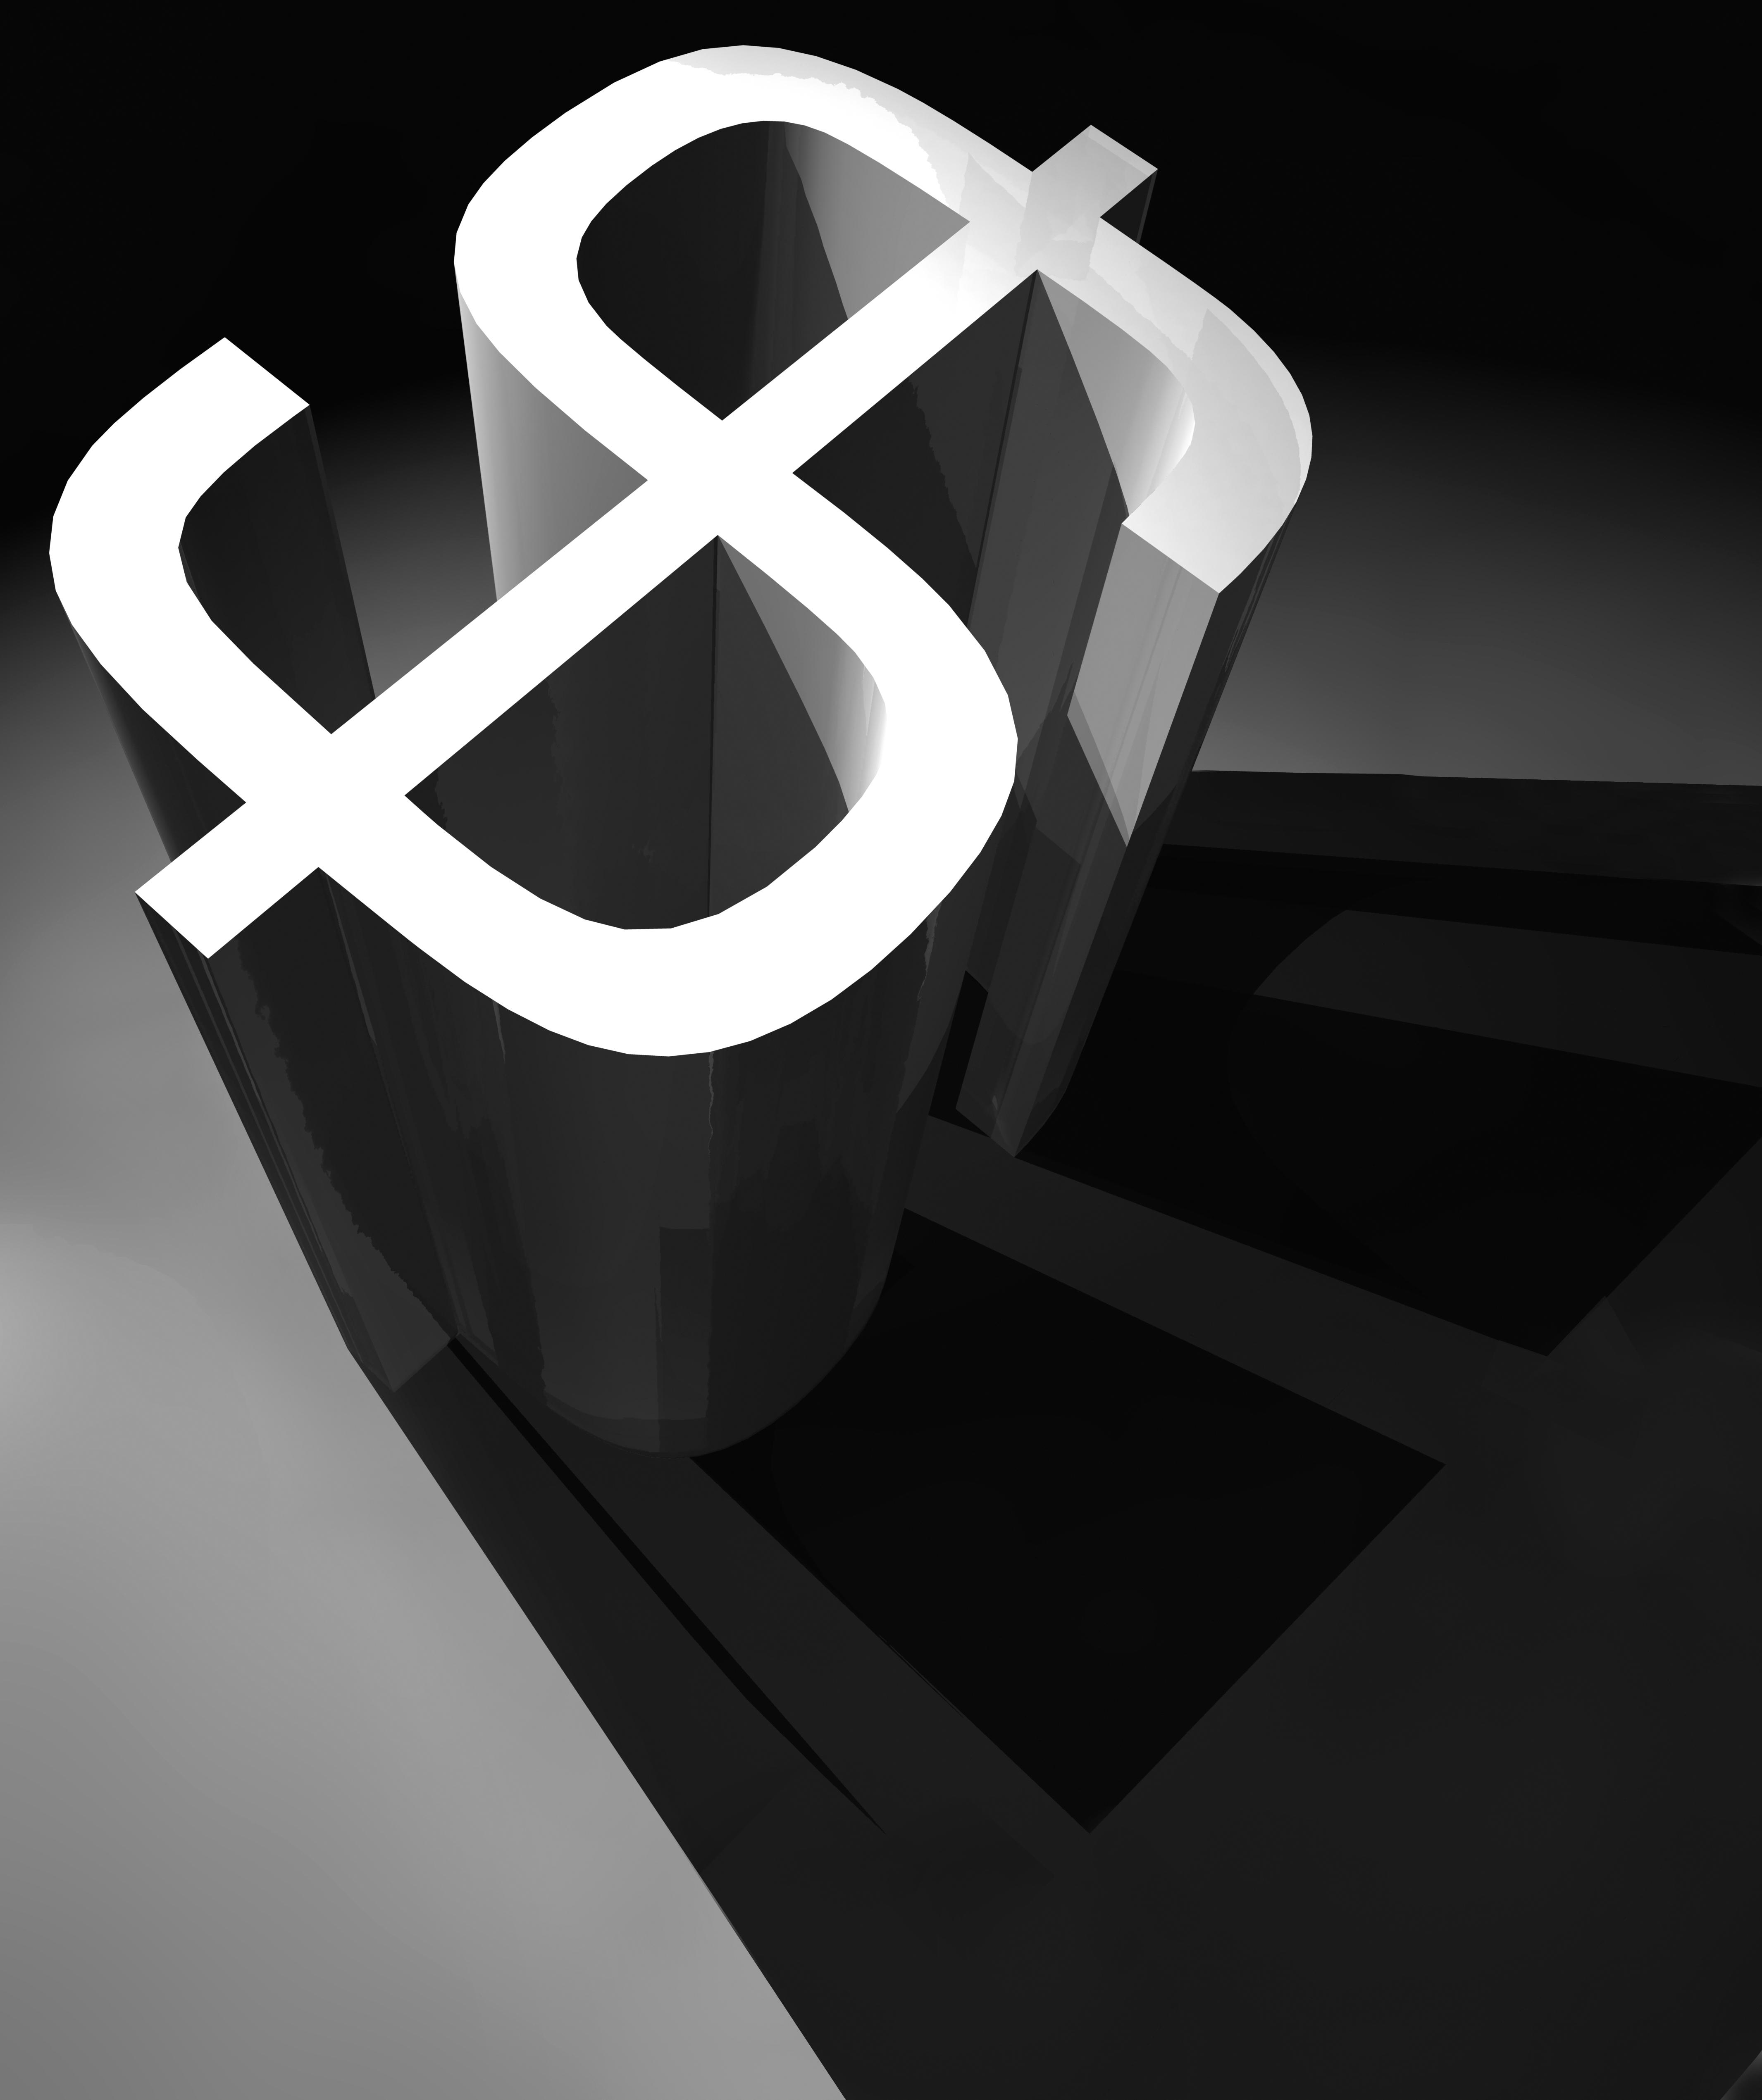 stockvault-dollar128664.jpg